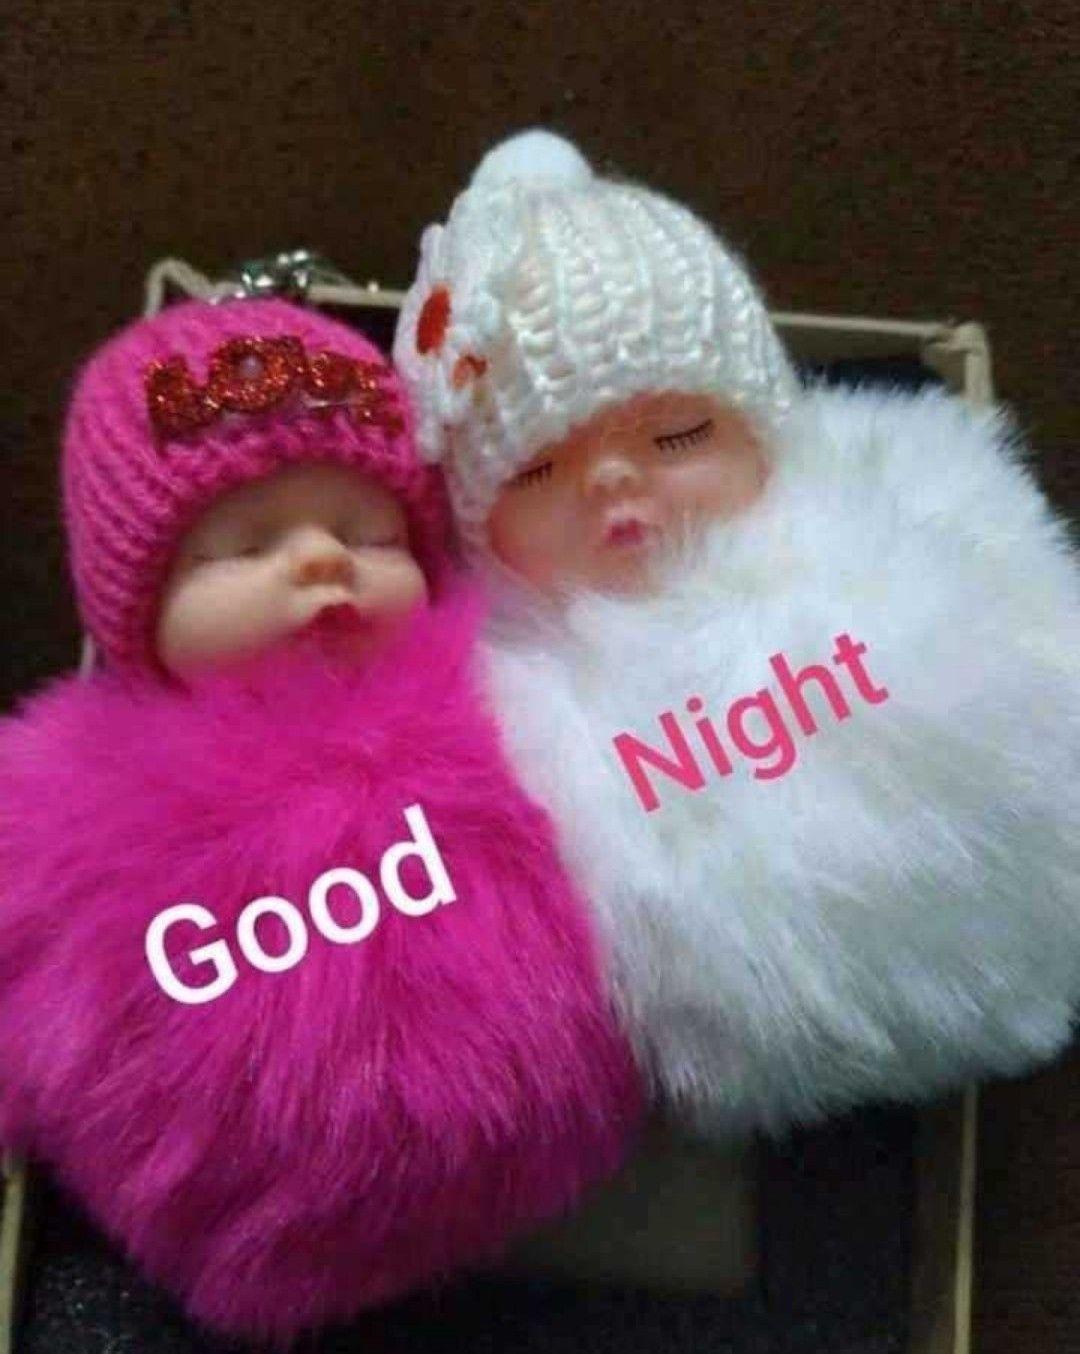 550 + Best Good Night Image || Good Night Image For Love || Good Night Image For Lover || Good Night Image Download || Good Night Image Hd